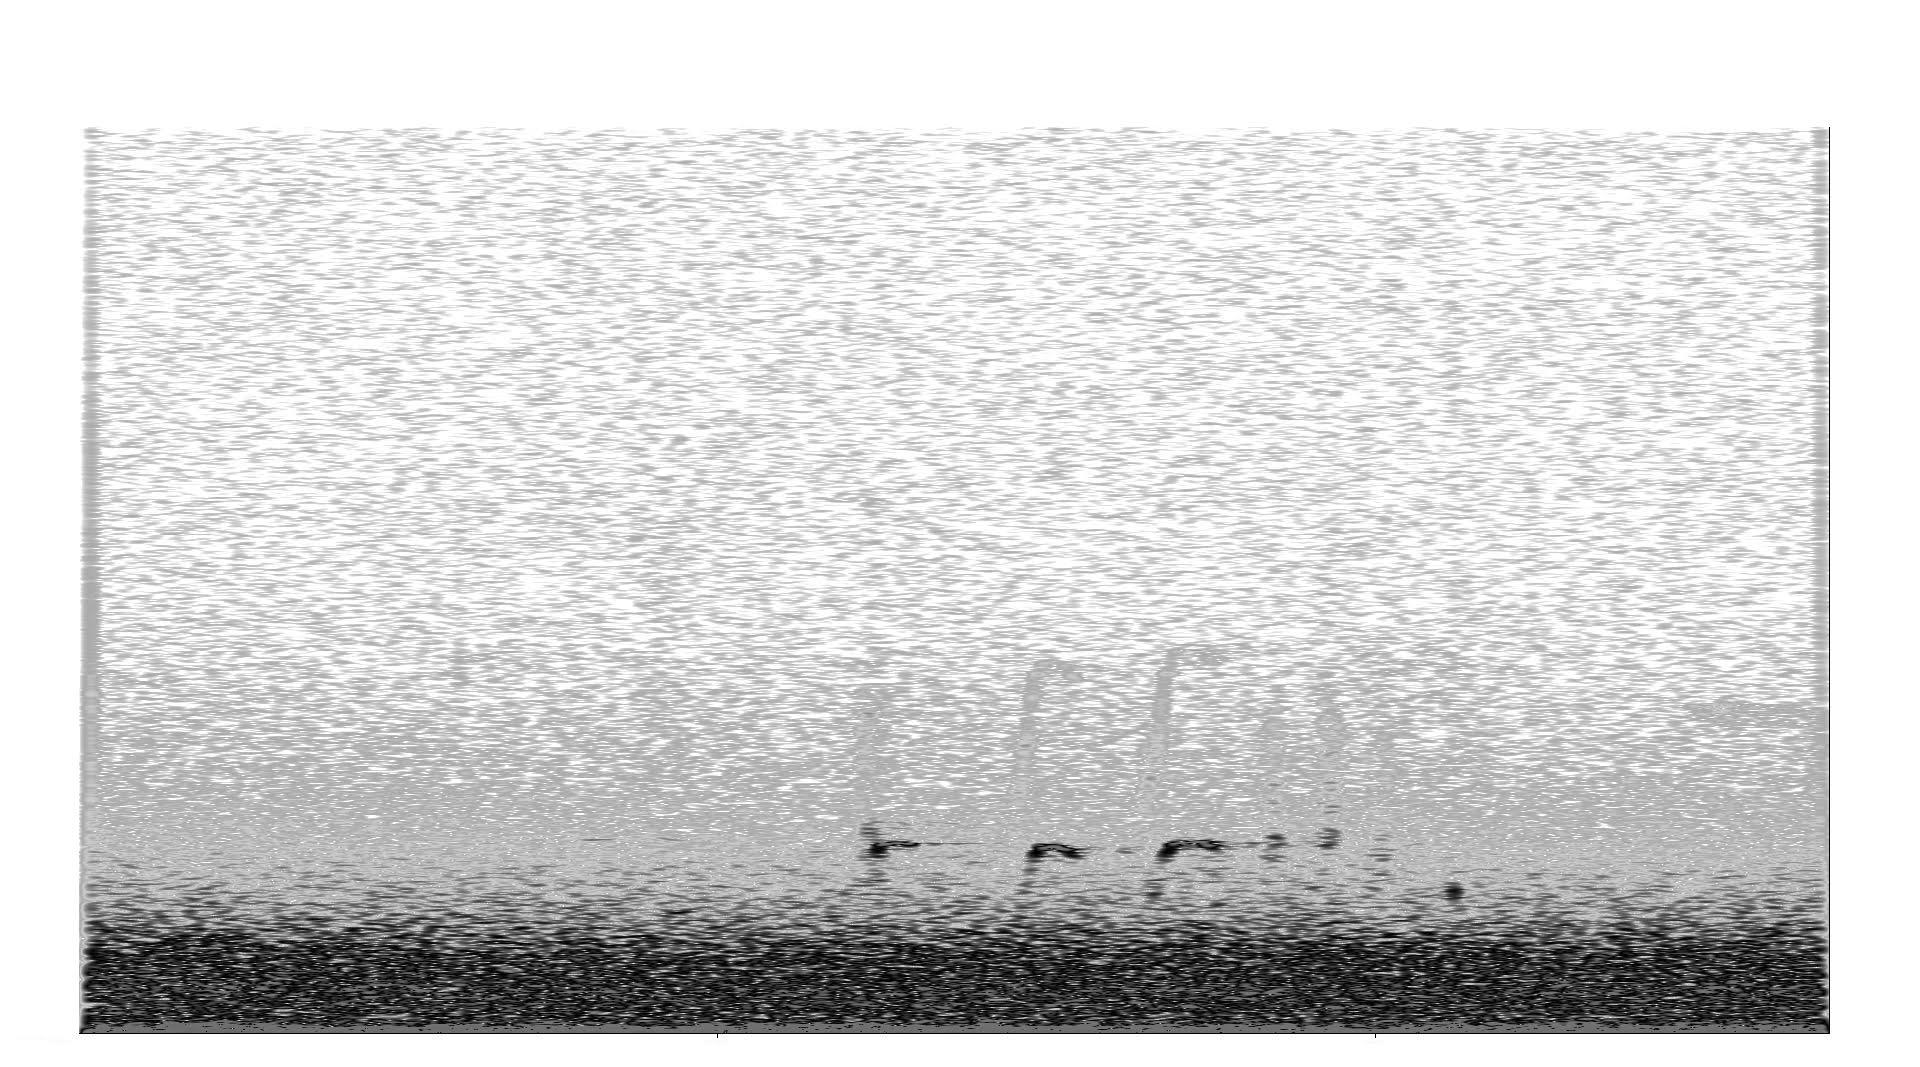 K.r.m. Mooney   Spectrogram I , 2018, Spectrogram, 6 x 3 ⅛ inches